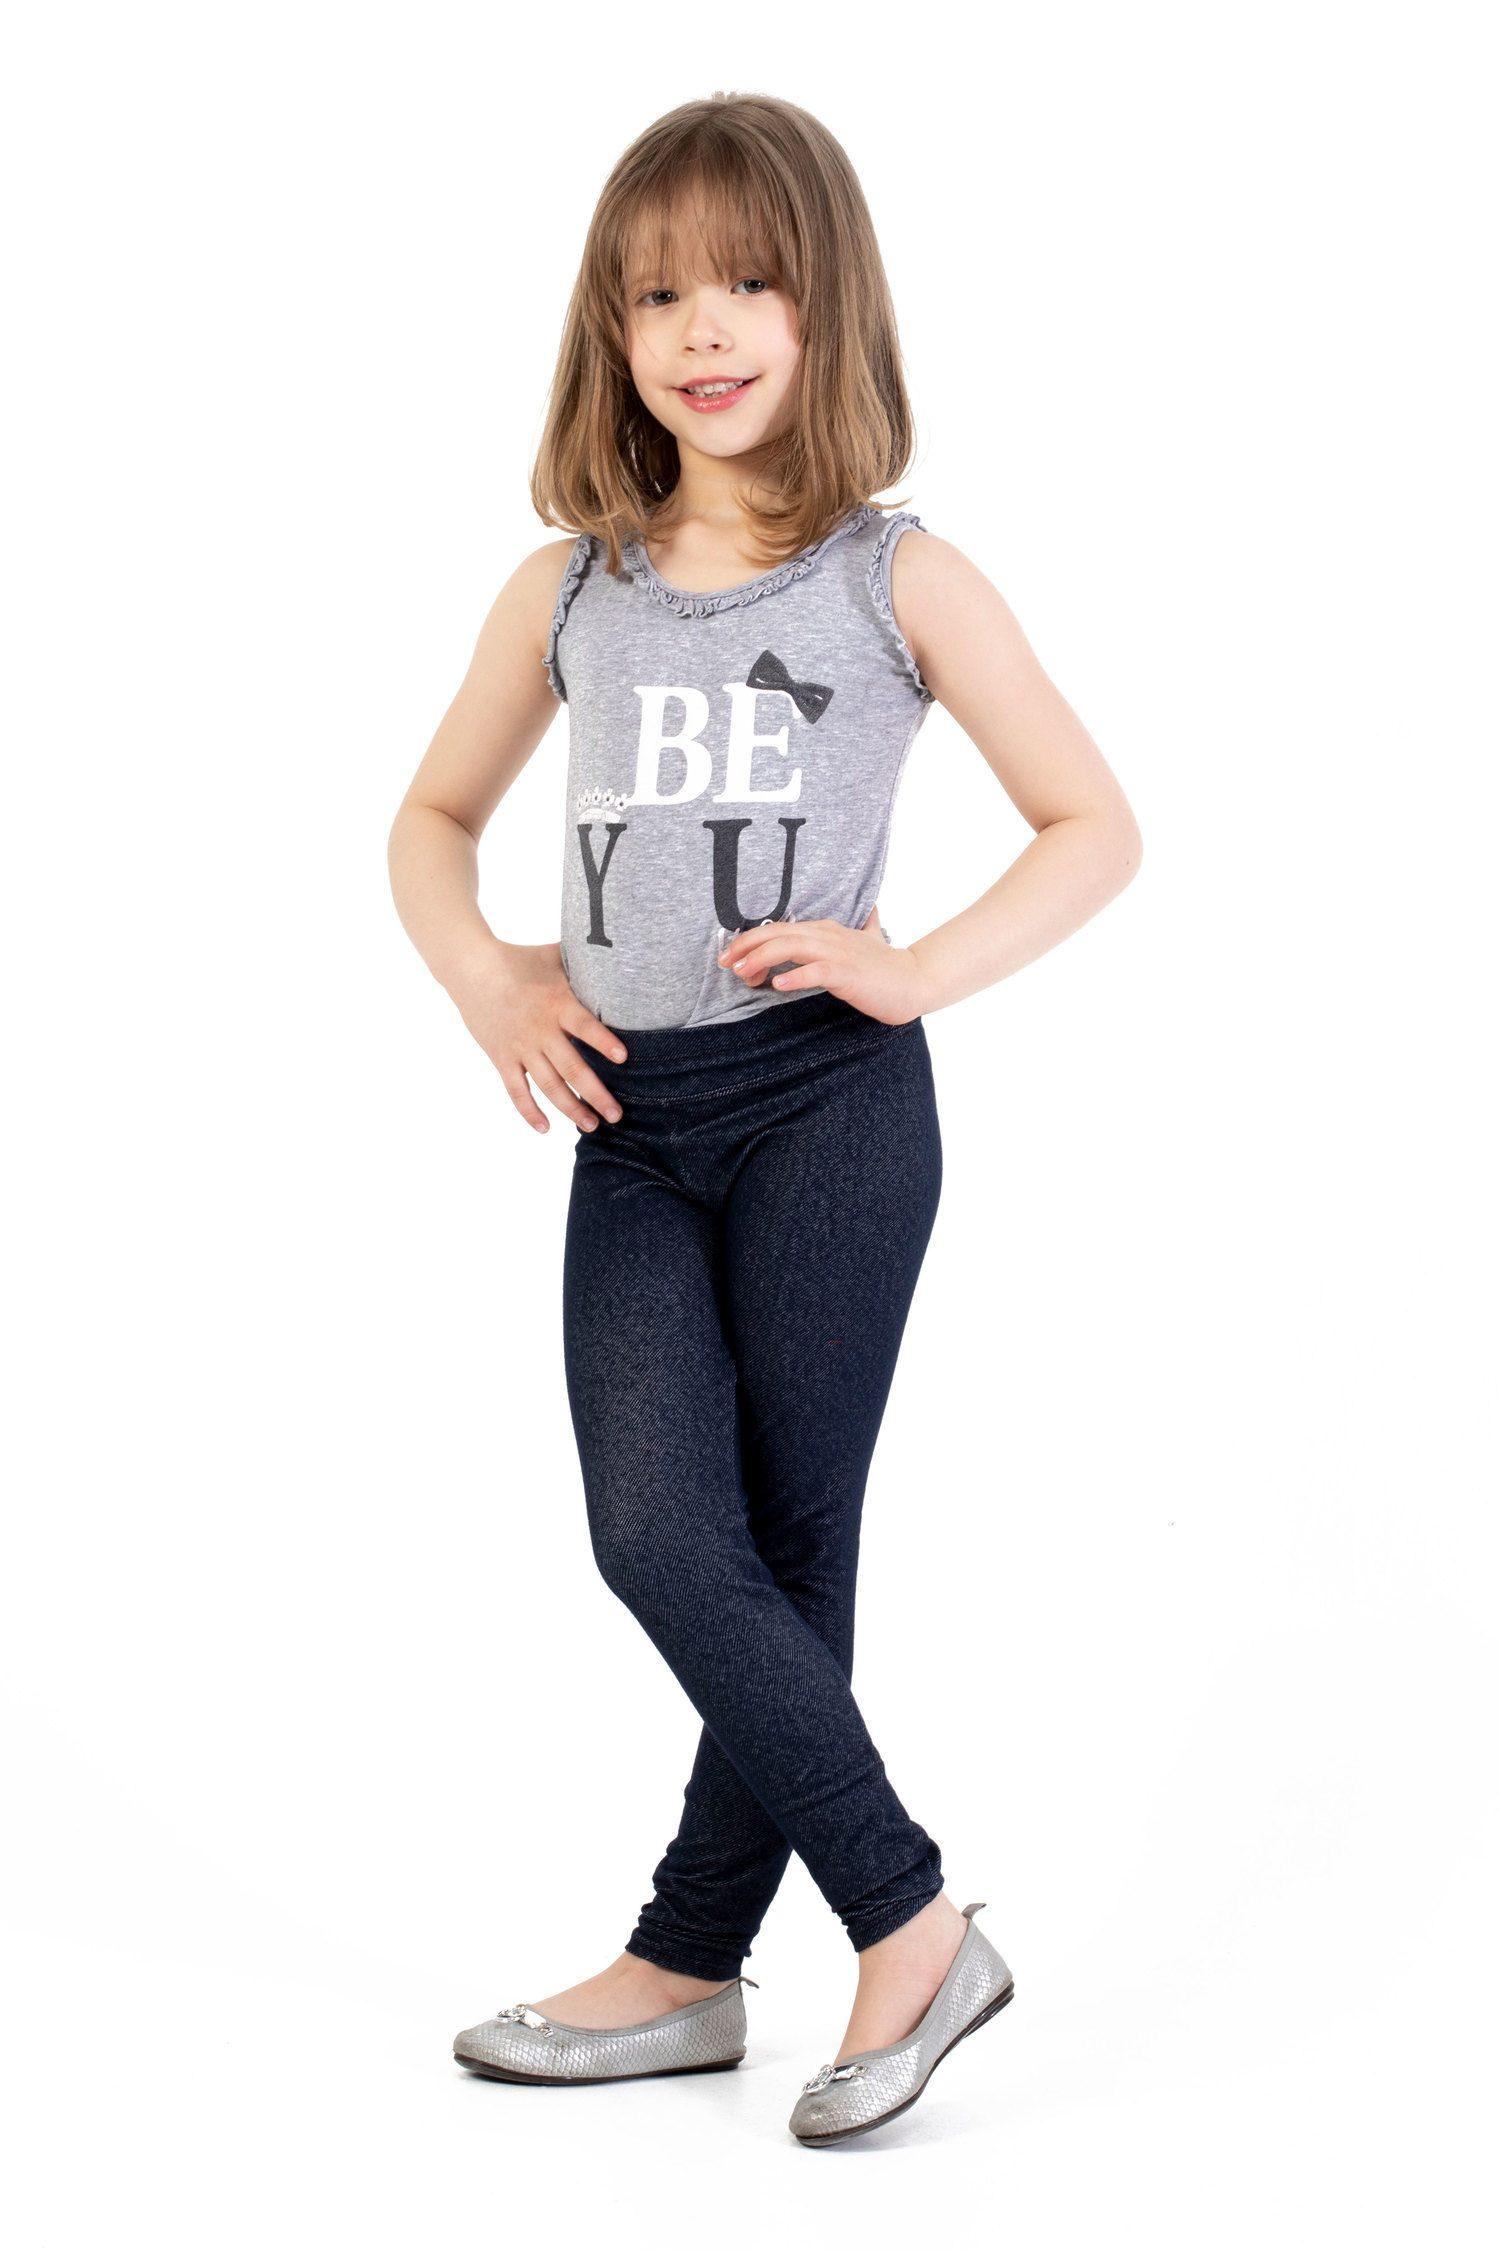 Legging Cotton Jeans OverKids  (Ref 101003)